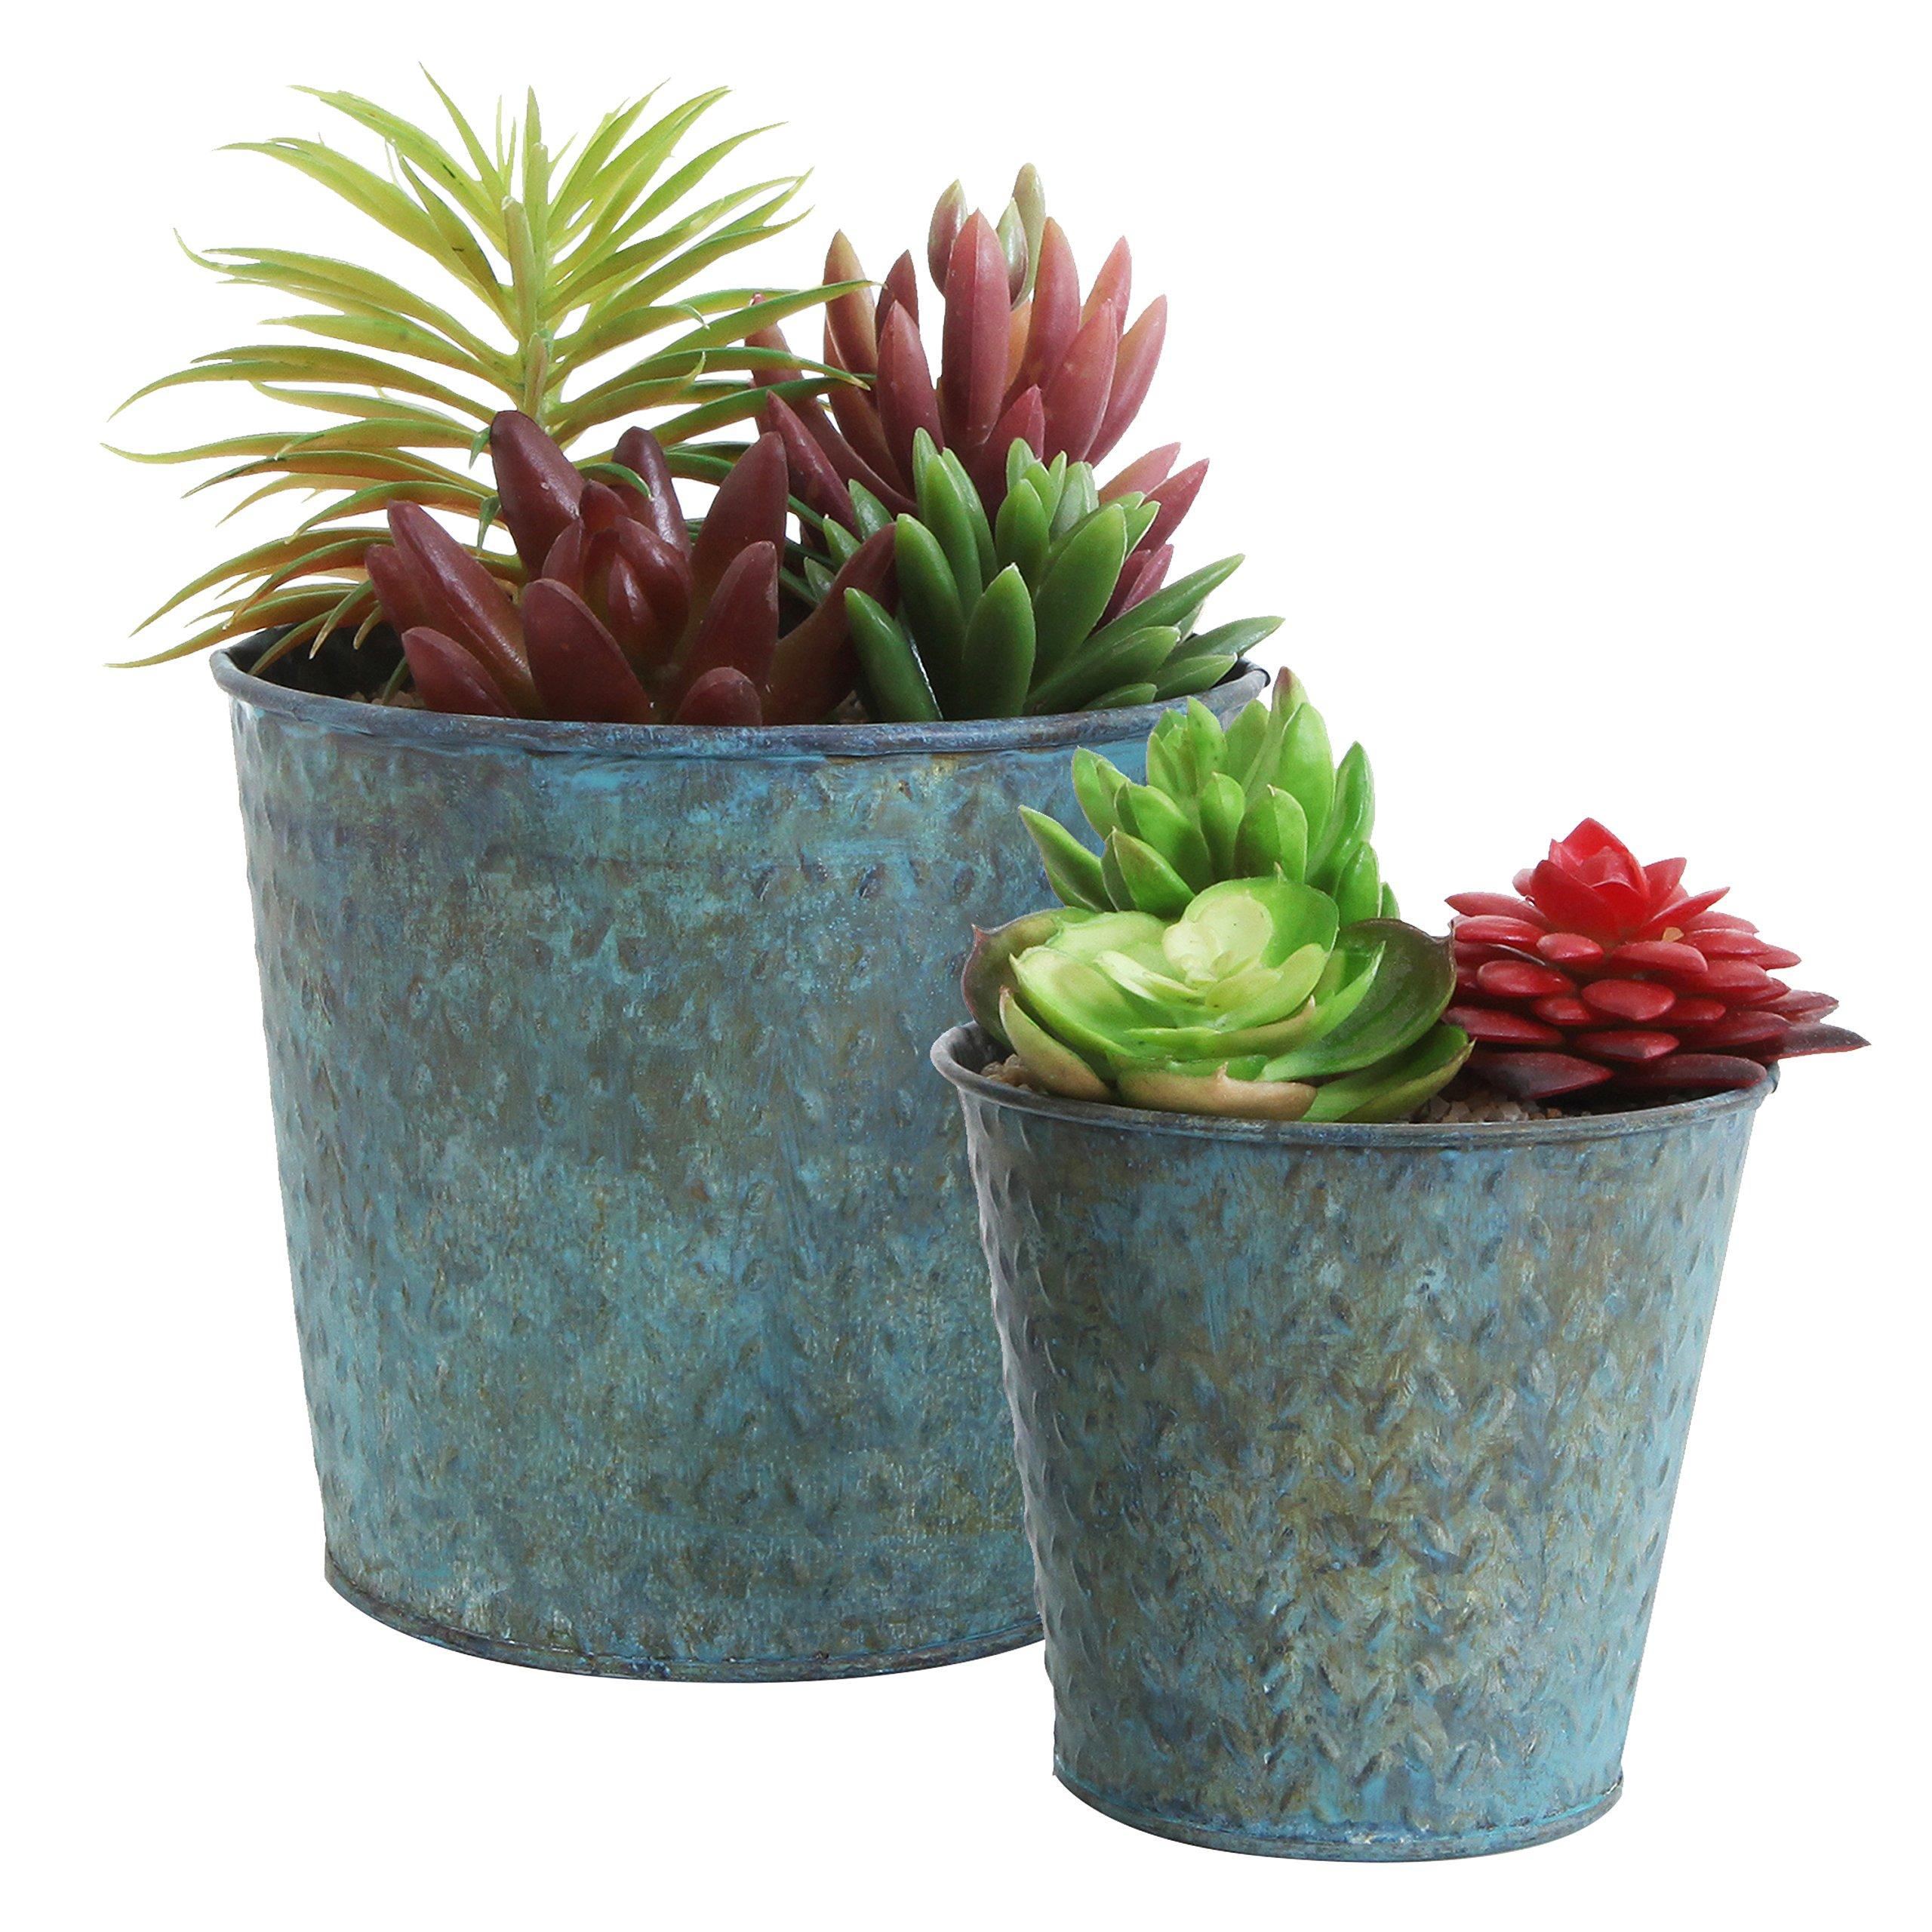 225 & Metal Rustic Flower Pots: Amazon.com